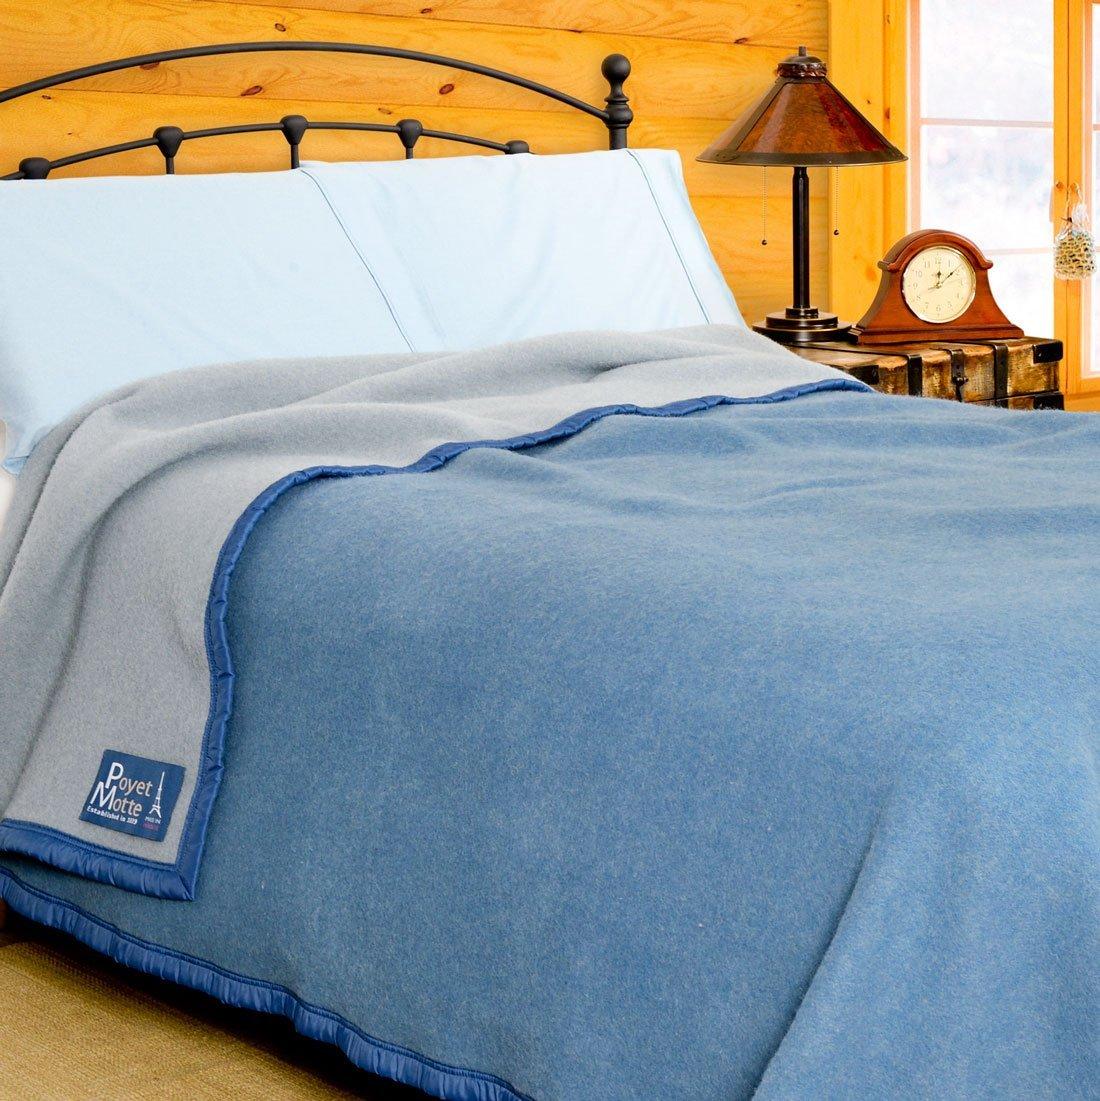 Poyet Motte Aubisque 500GSM Heavyweight 100-Percent Wool Blanket (Twin, Blue/Lt Blue)